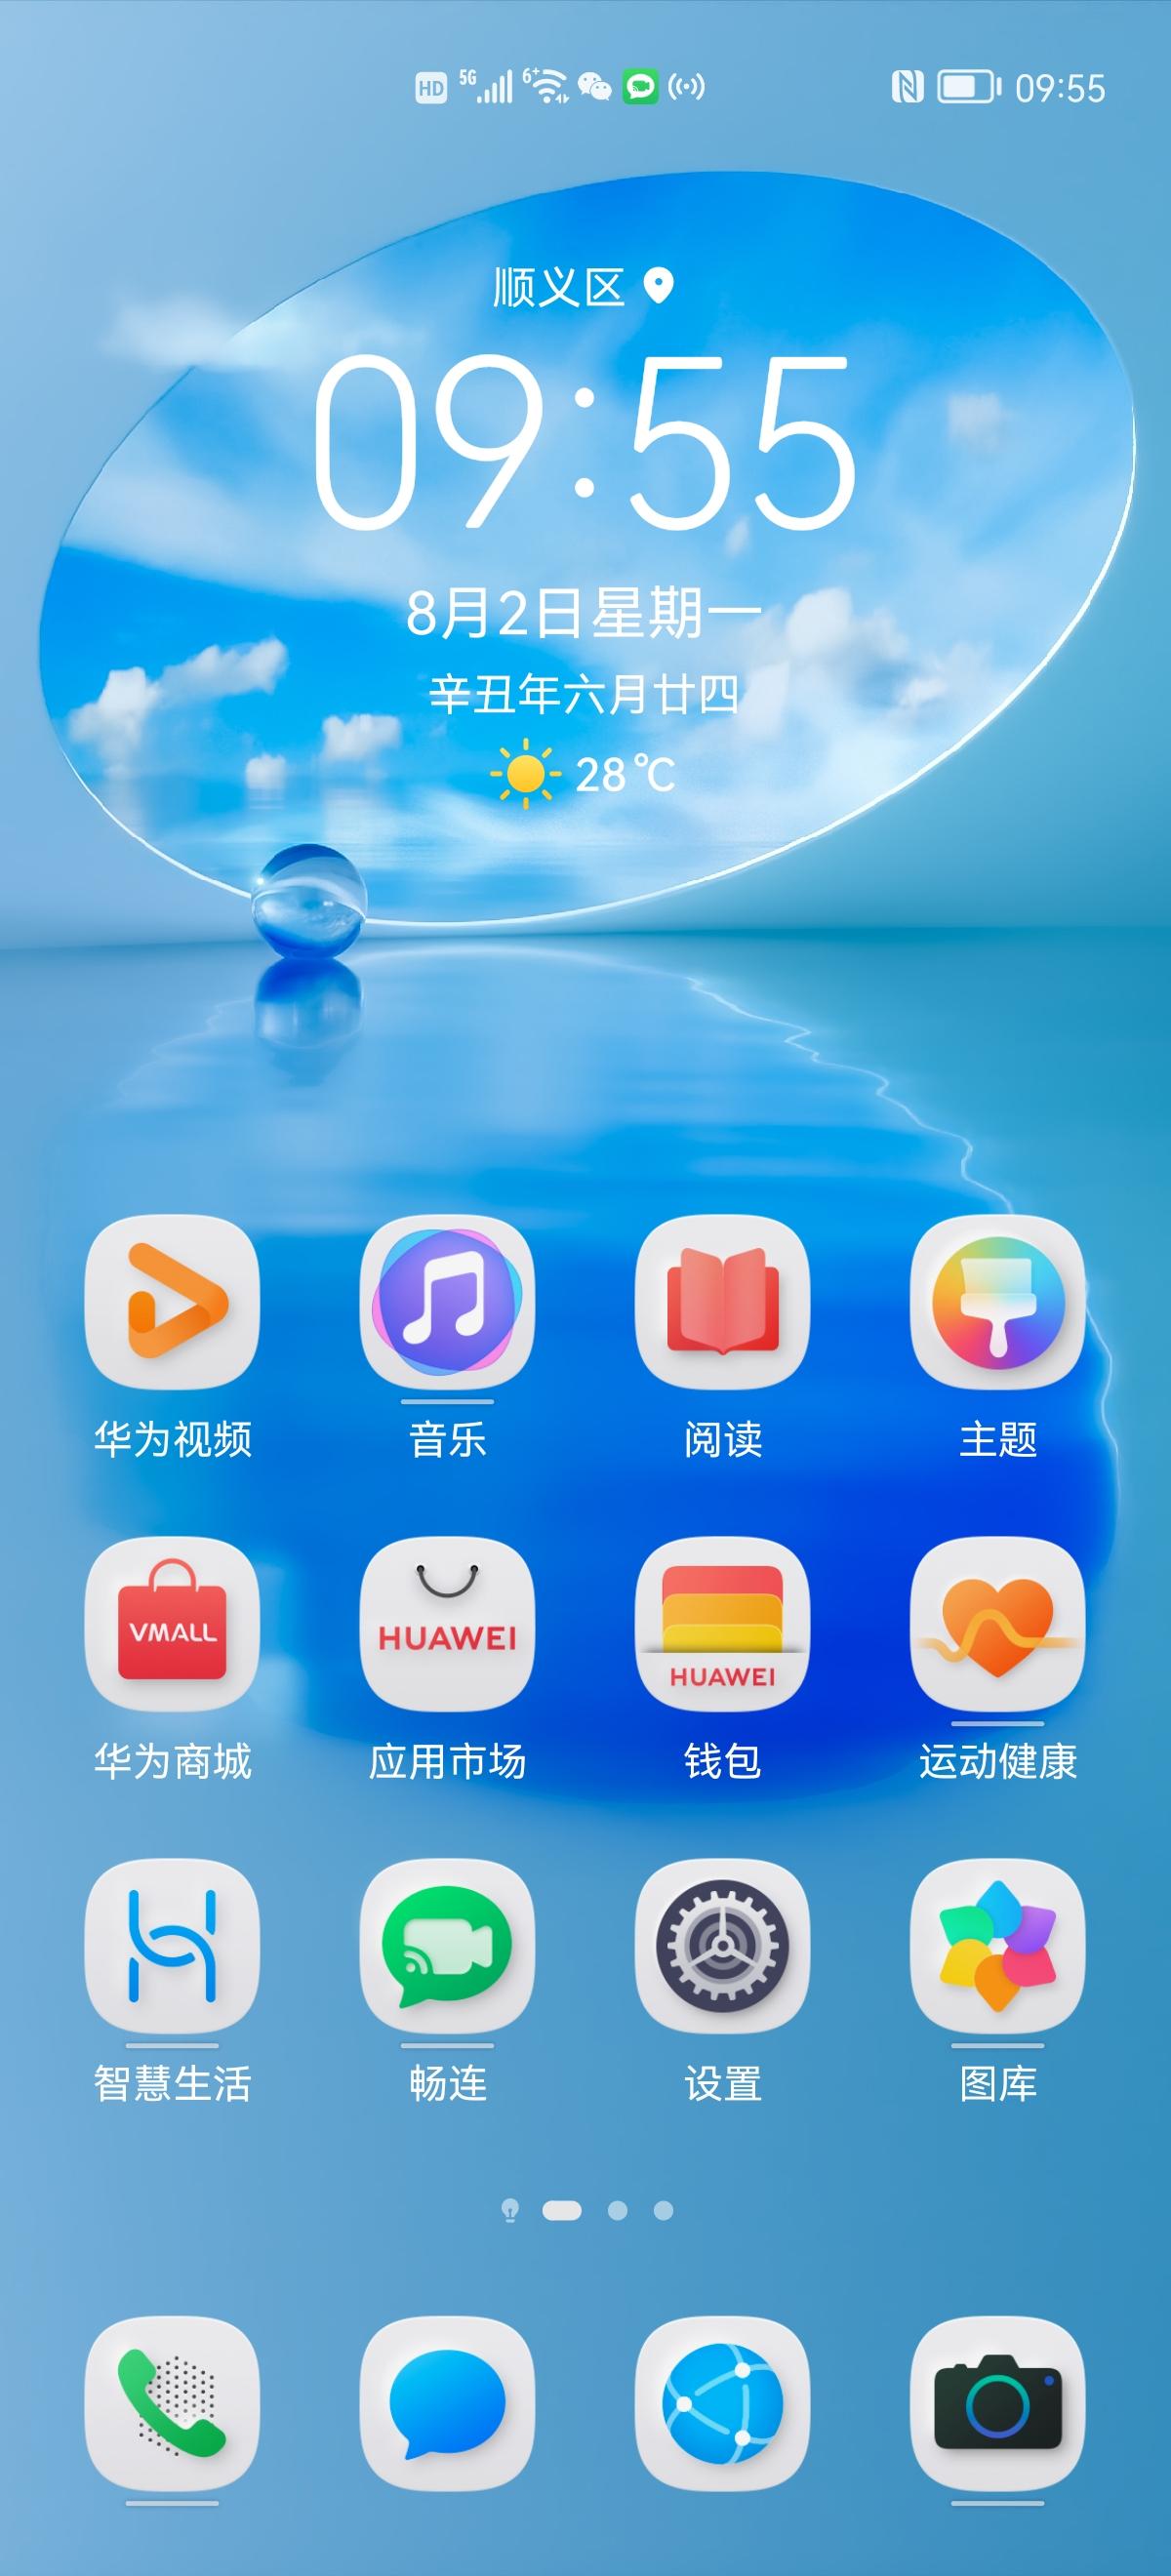 Screenshot_20210802_095536_com.huawei.android.lau.jpg